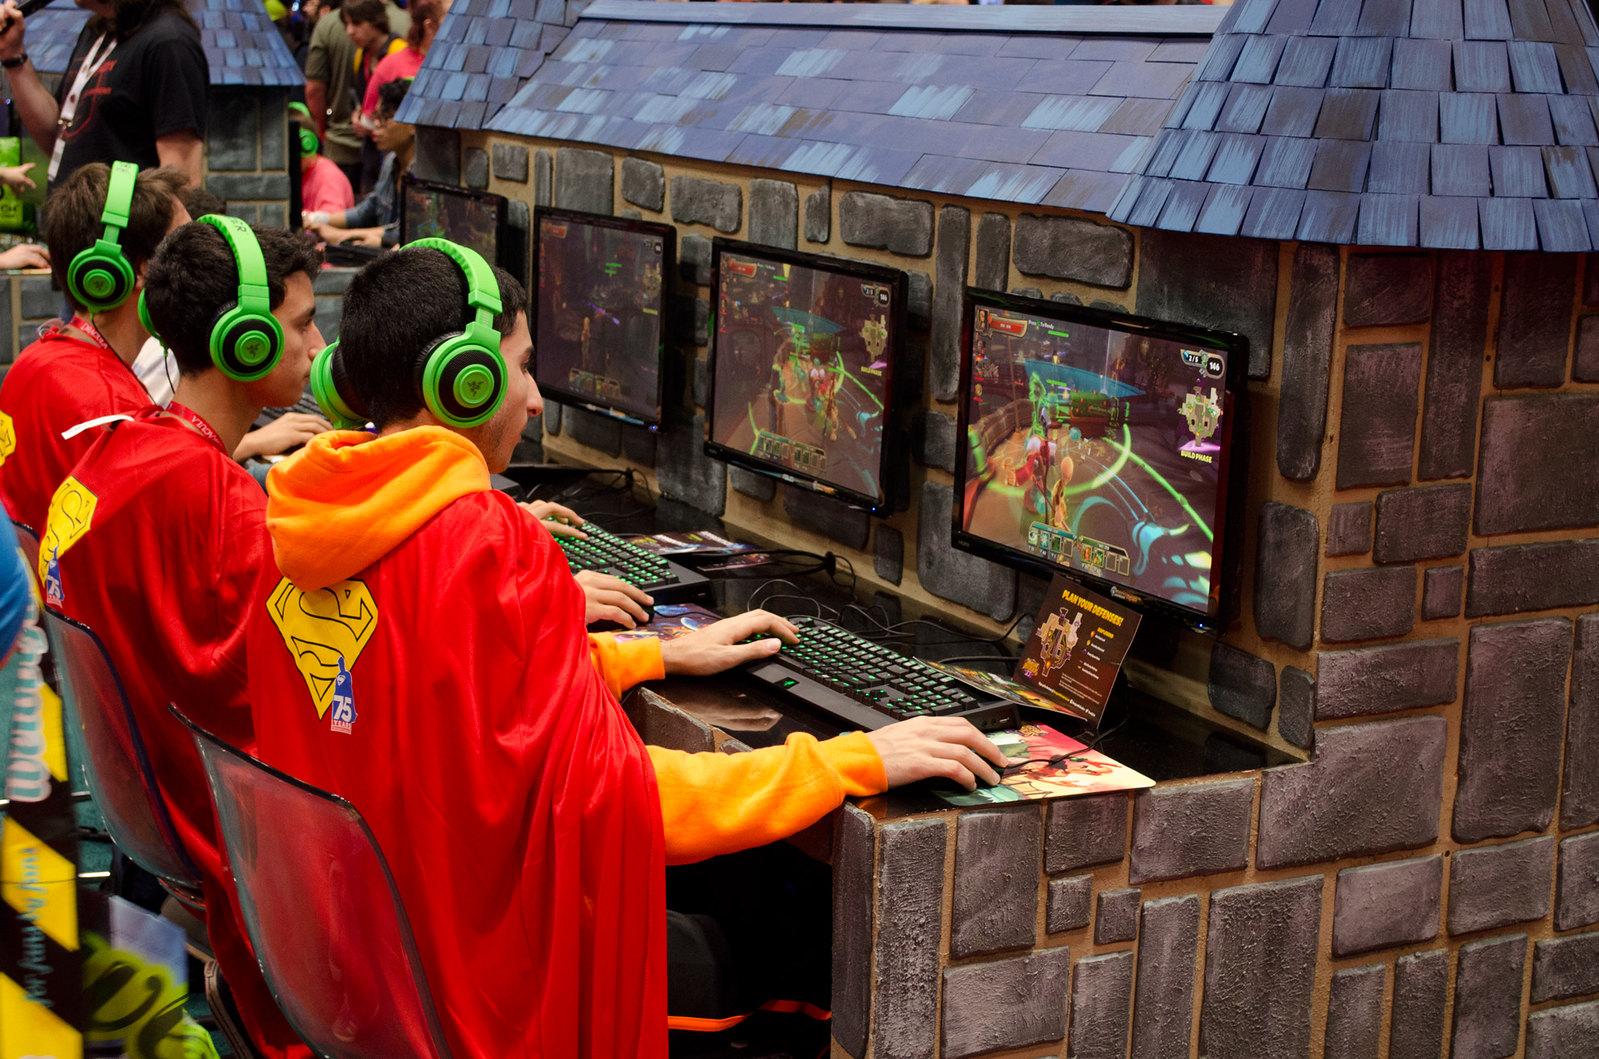 NYCC Gaming